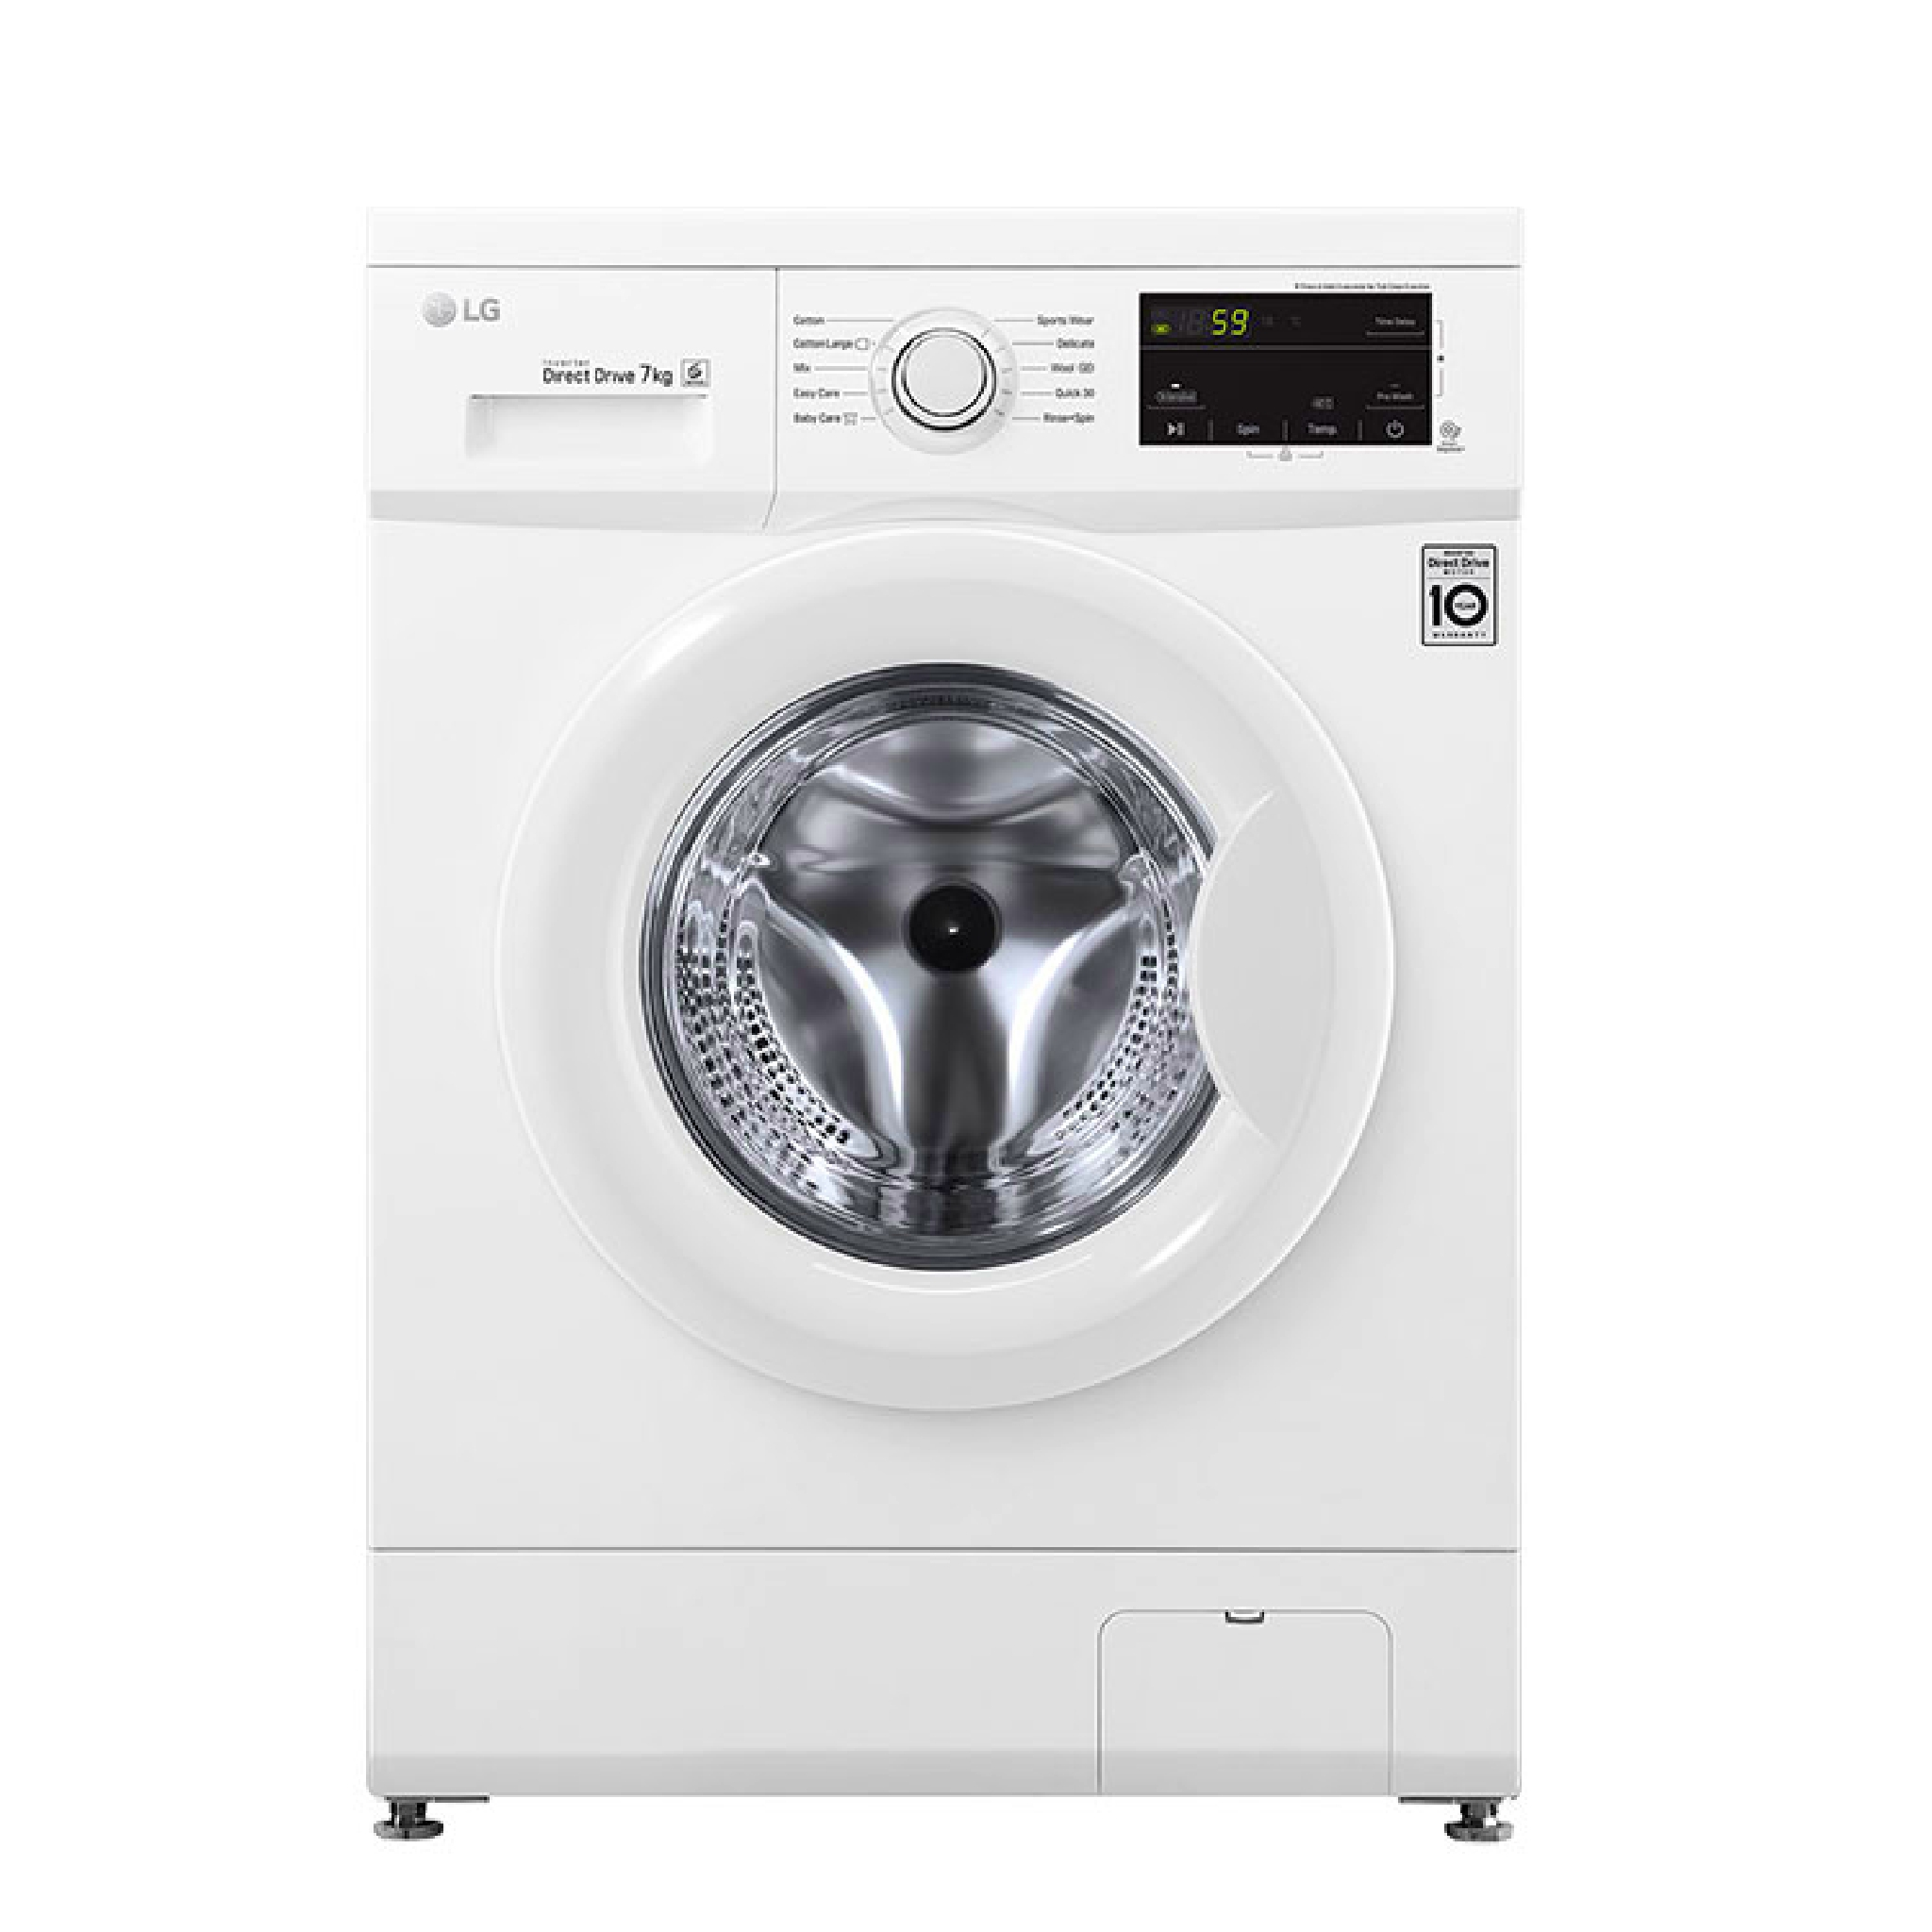 Best front loading washing machines - LG Front Load Washing Machine